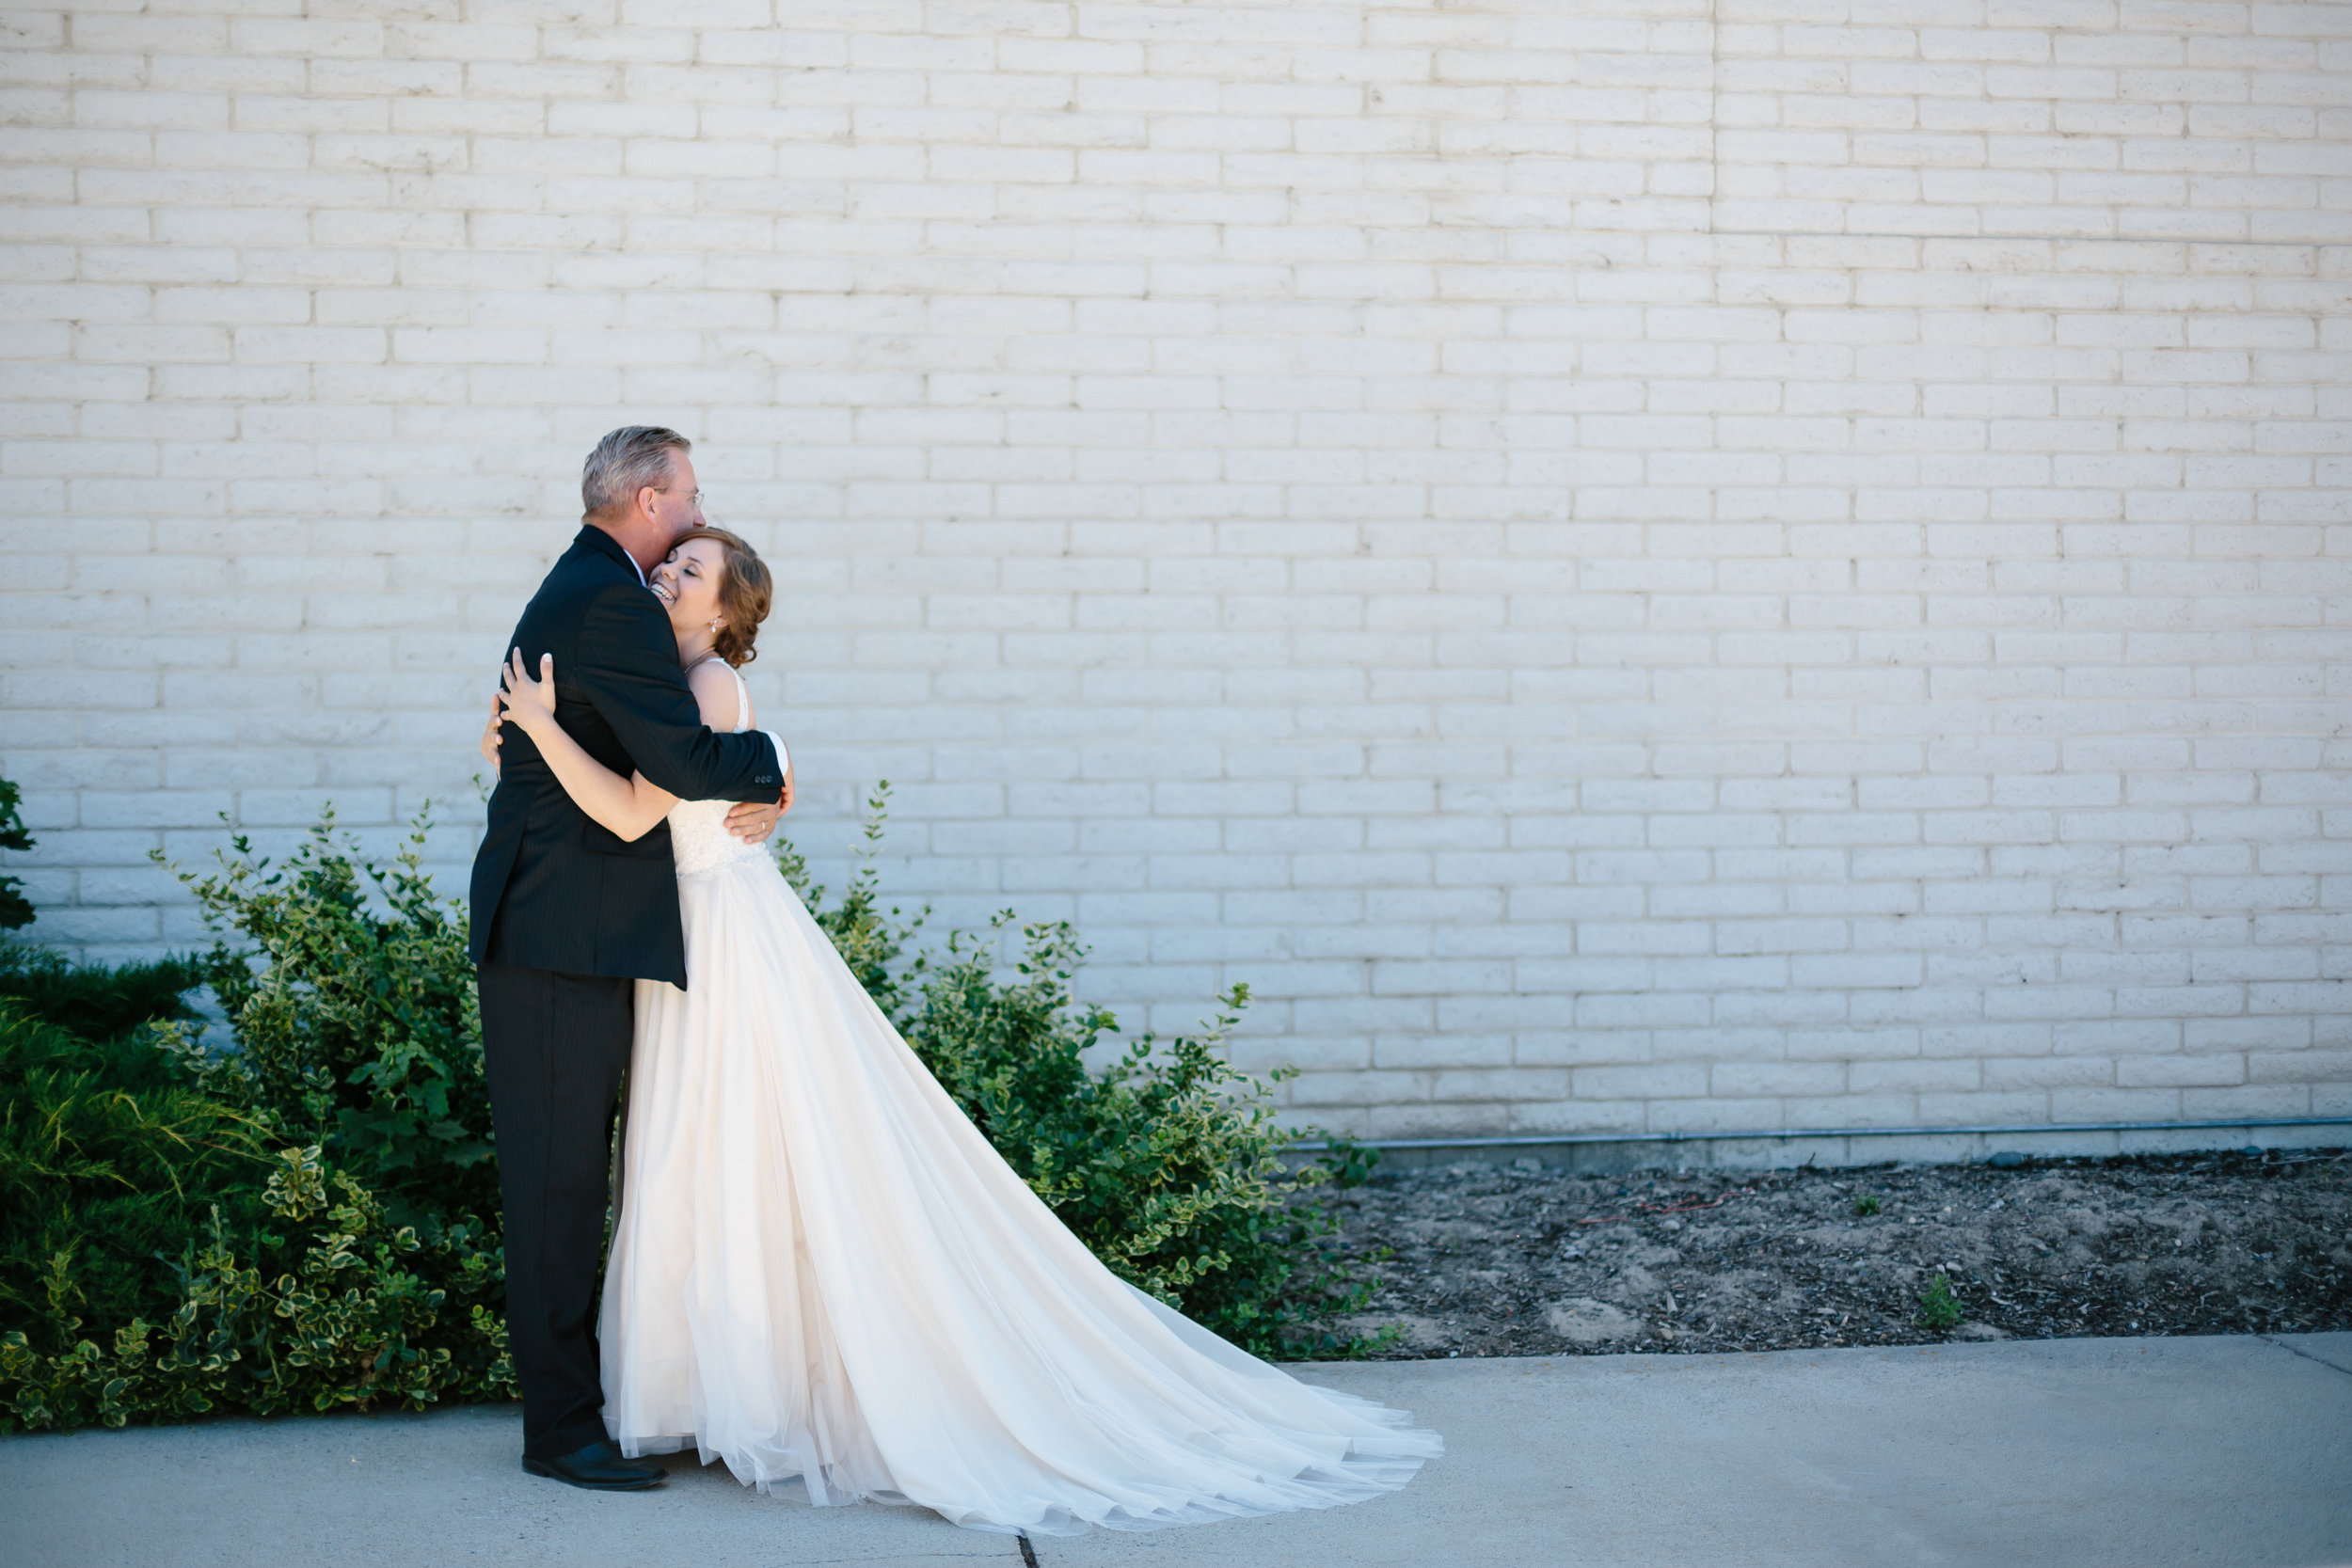 Jordan & Shantel Married - Idaho - Corrie Mick Photography-157.jpg